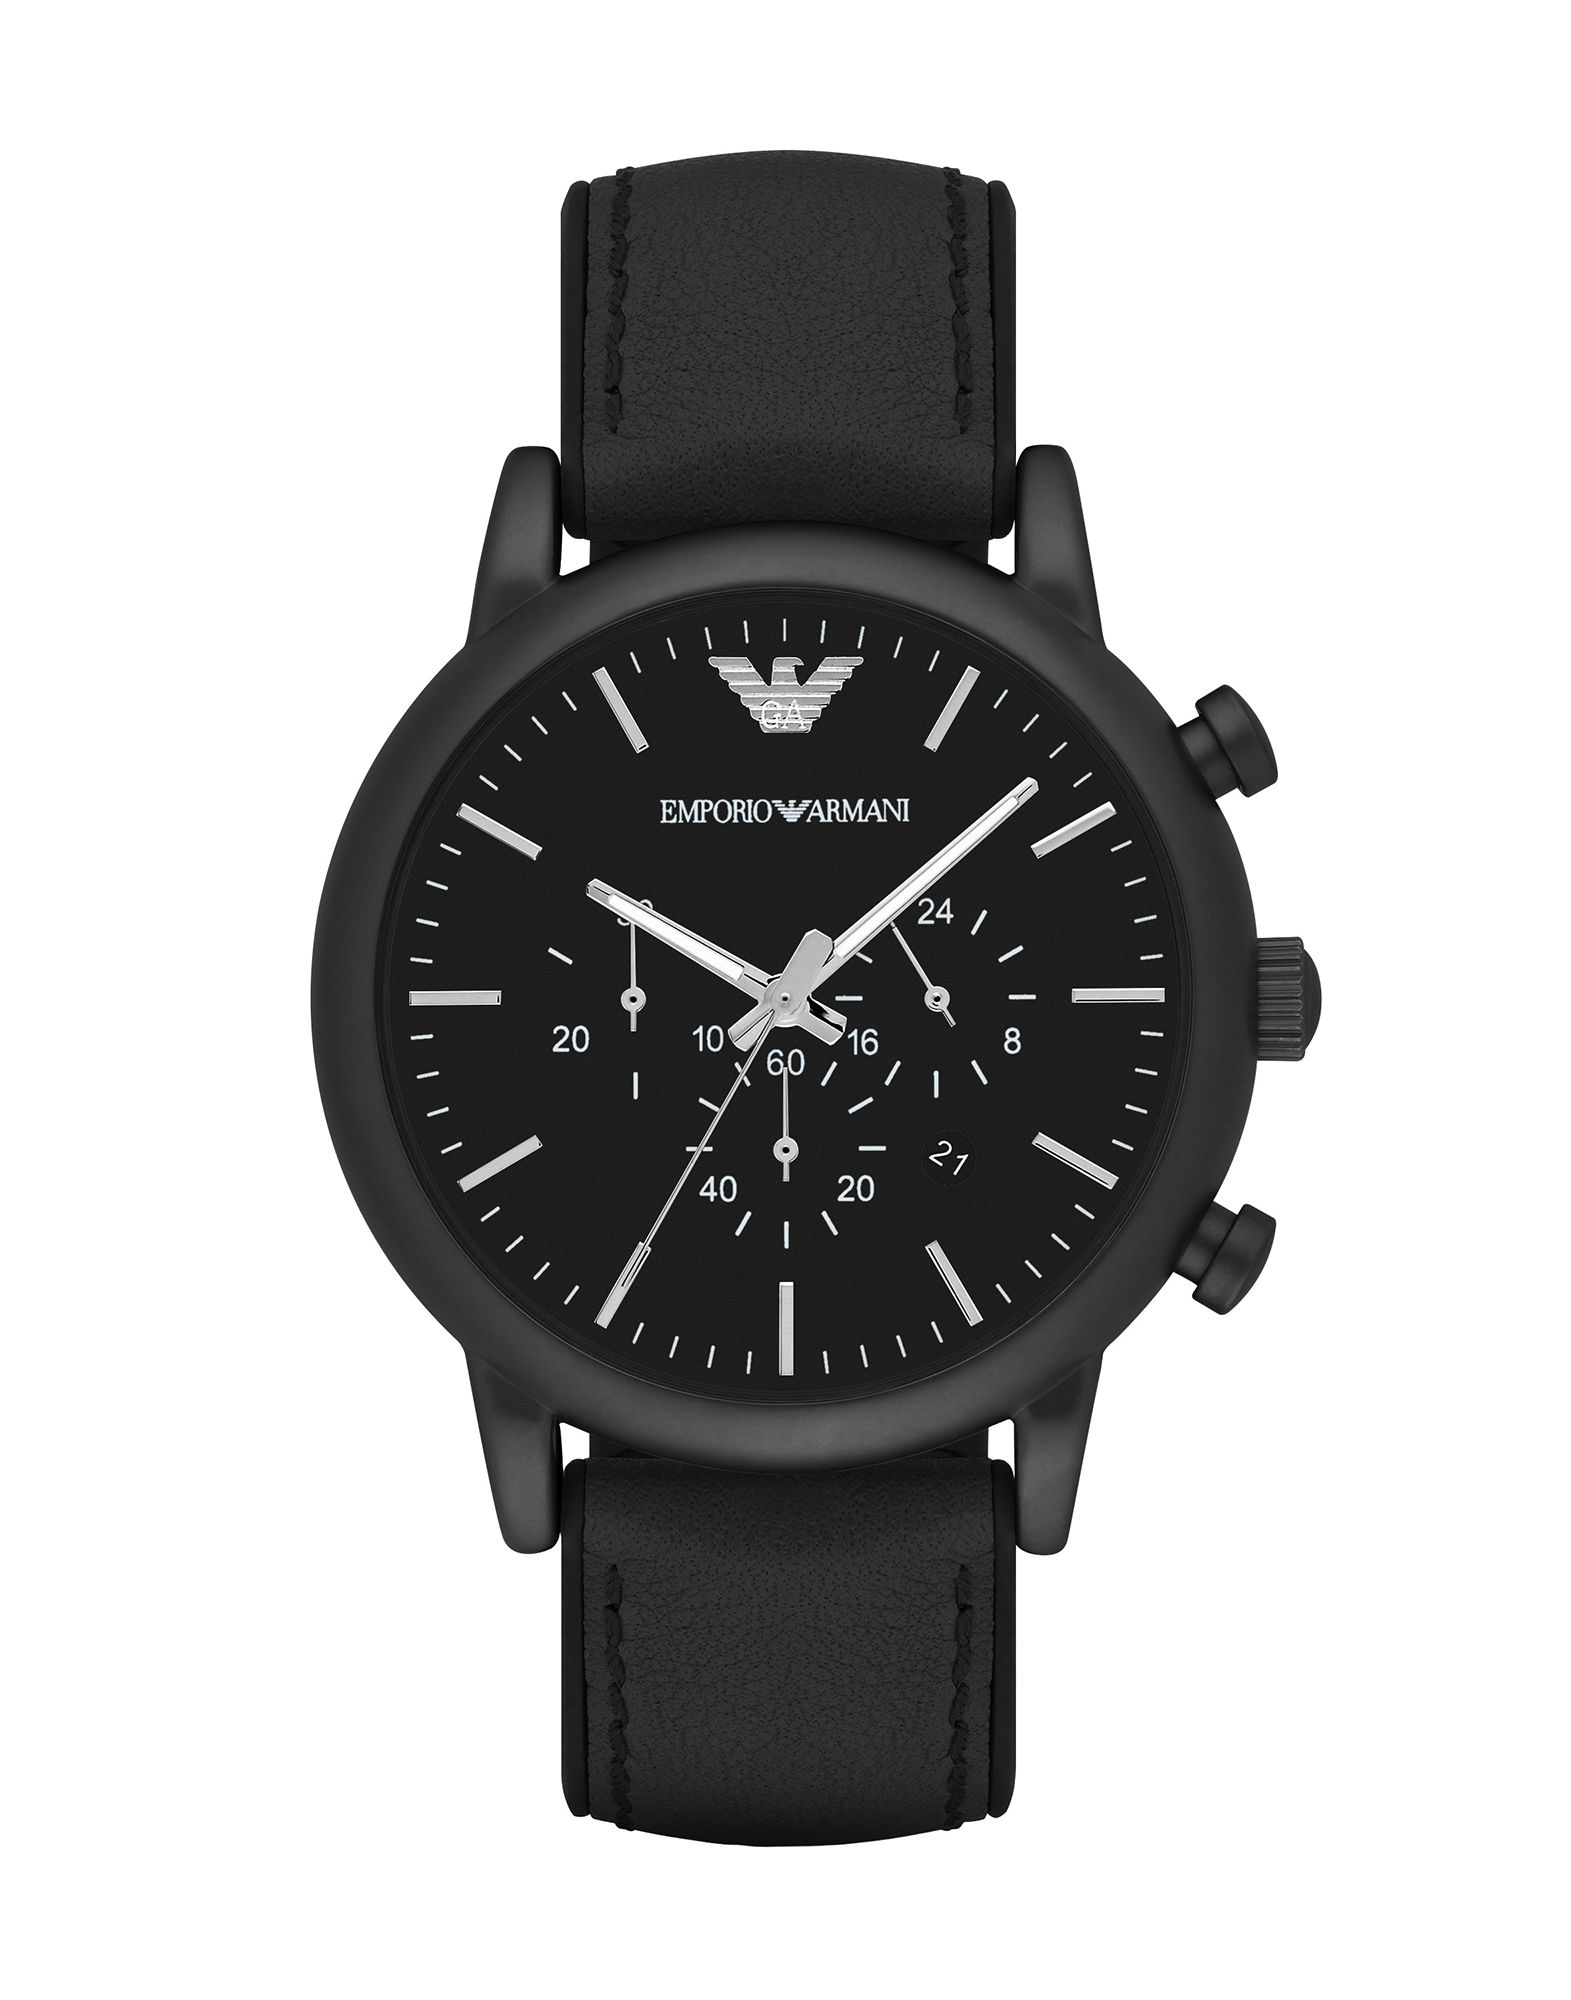 EMPORIO ARMANI Наручные часы цены онлайн